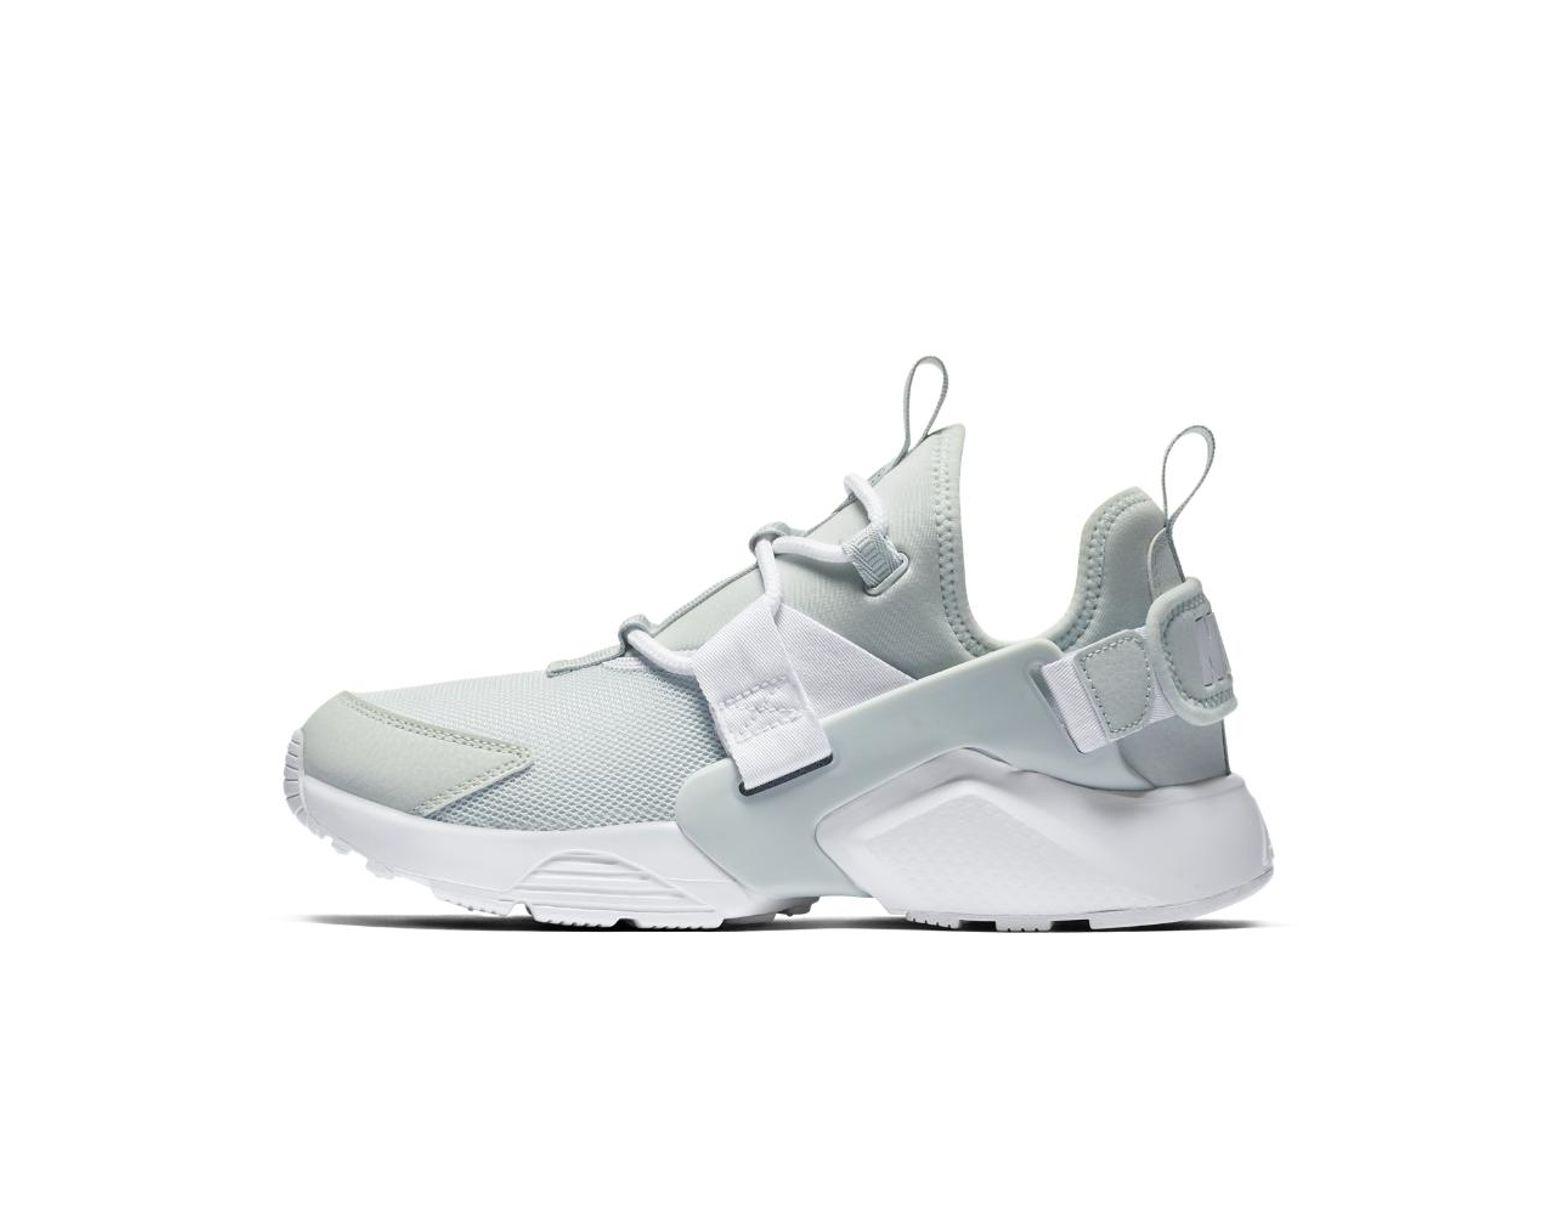 2cd09f3c01fa9 Lyst - Nike Air Huarache City Low Women s Shoe in Gray